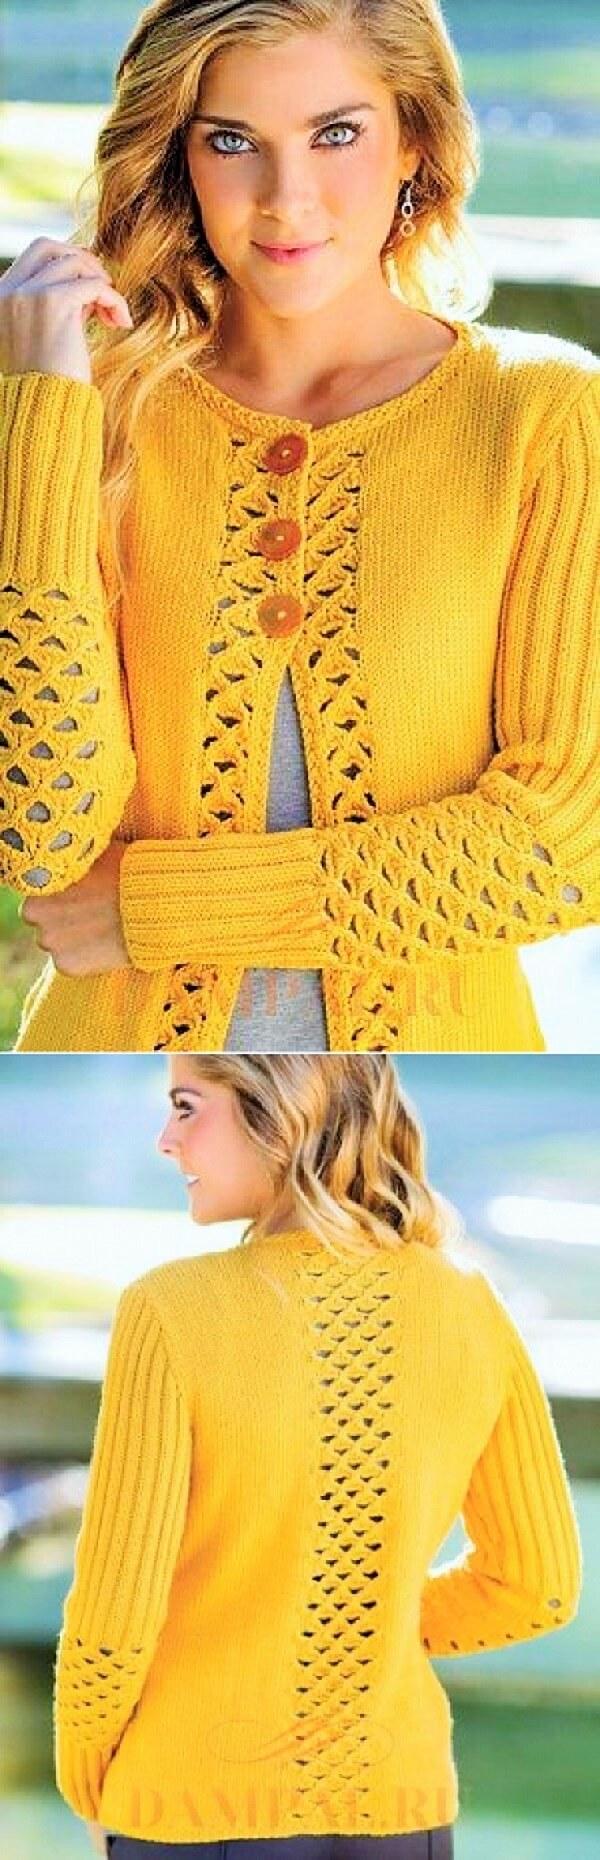 homemade with crochet Ladies Fashion Ideas -12